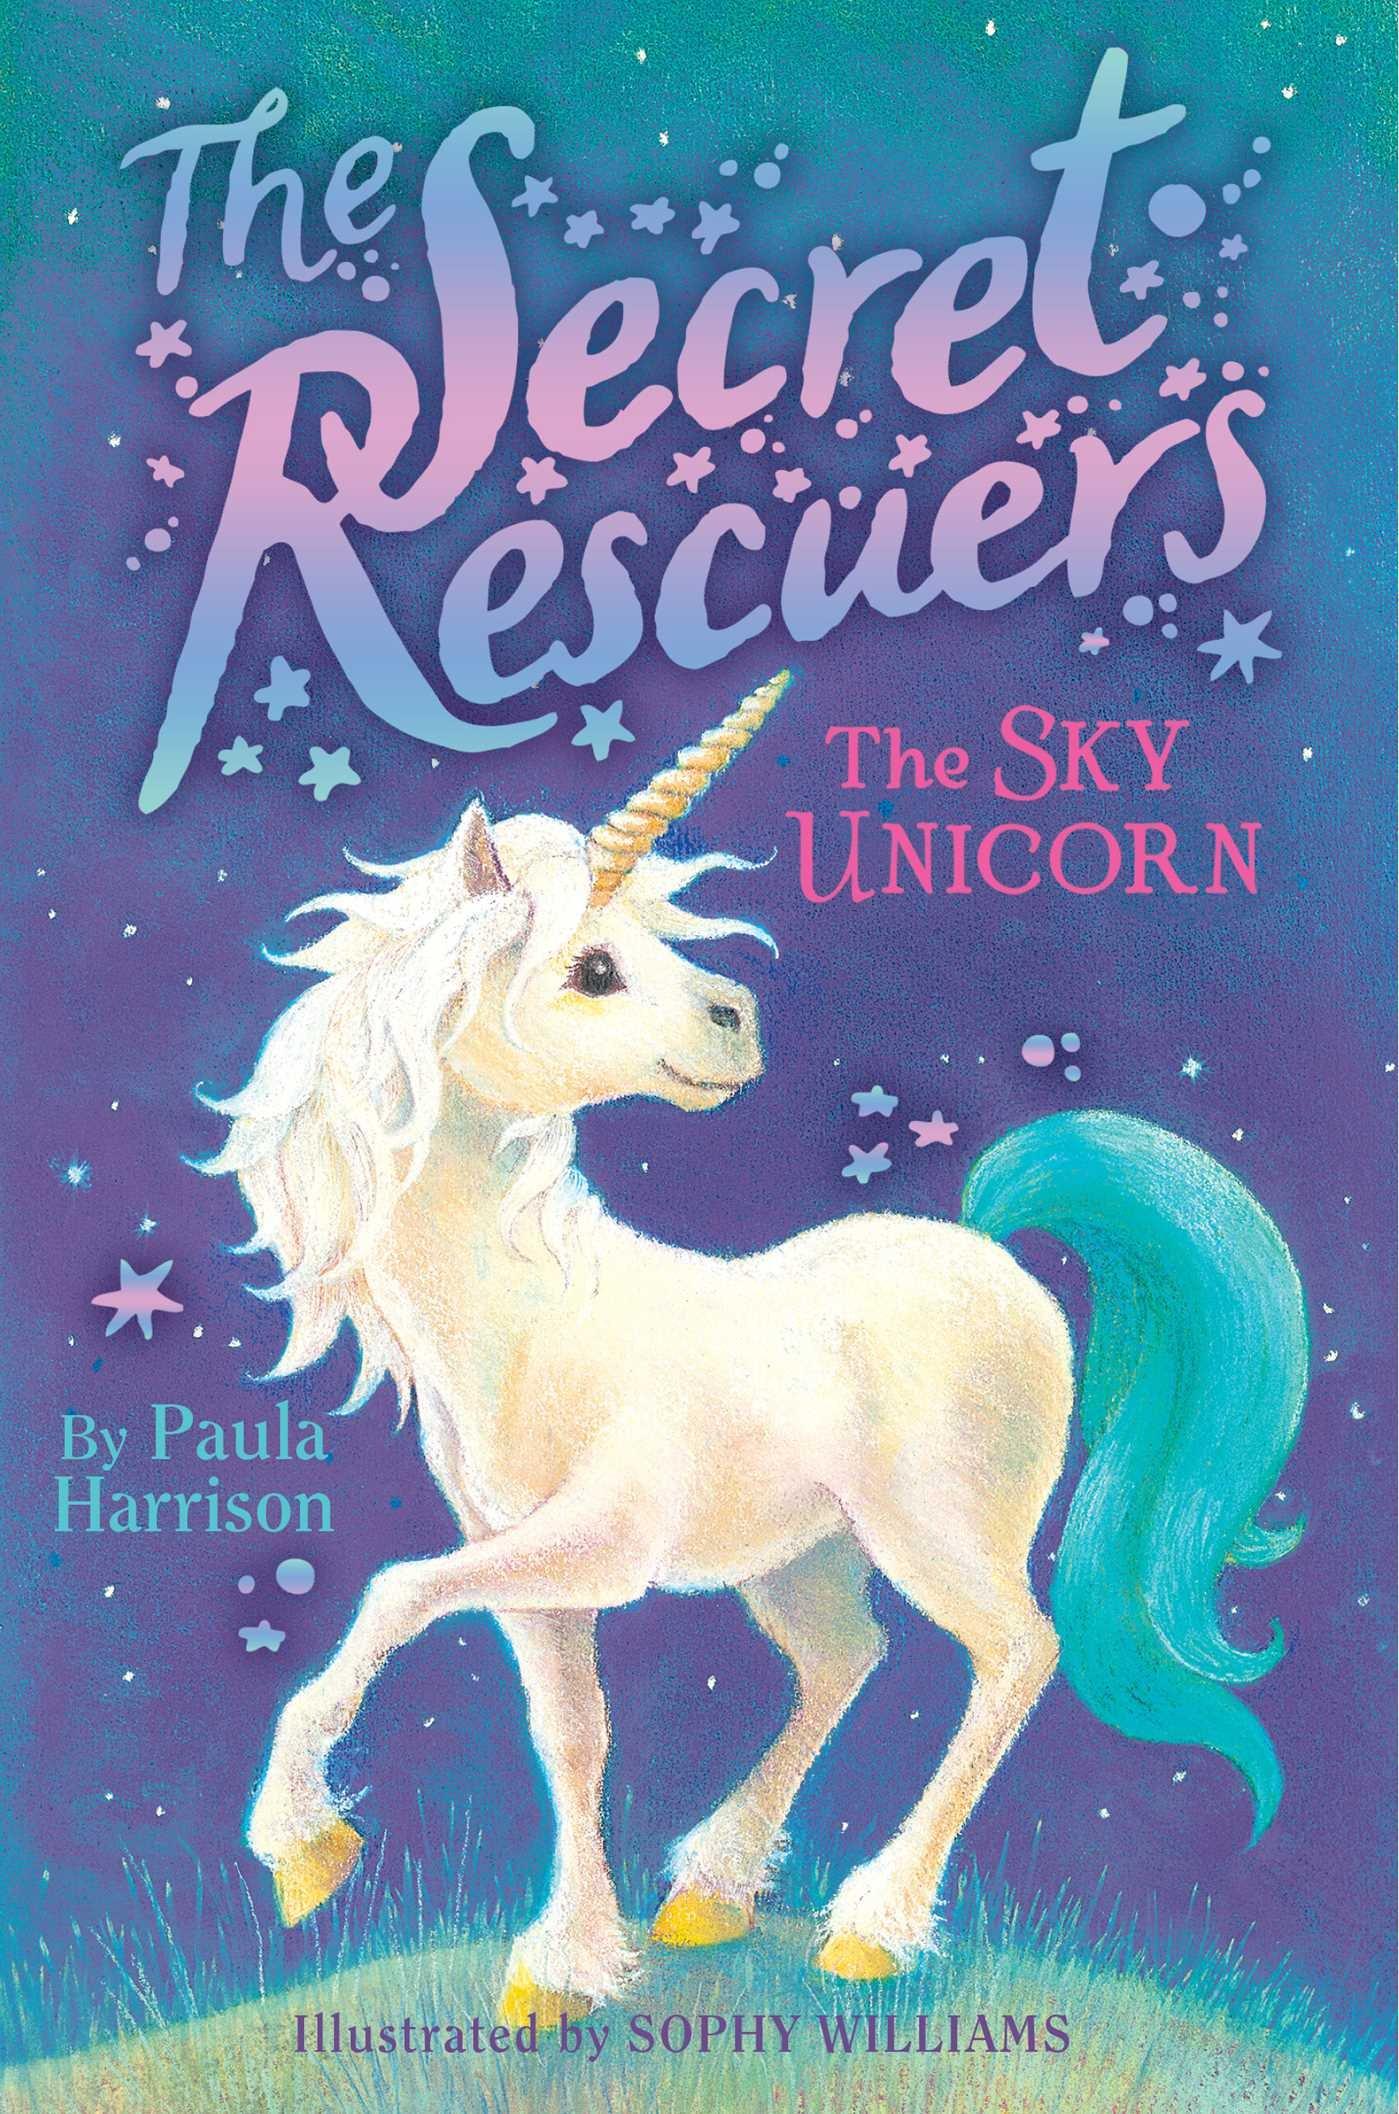 Read Online The Sky Unicorn (The Secret Rescuers) pdf epub